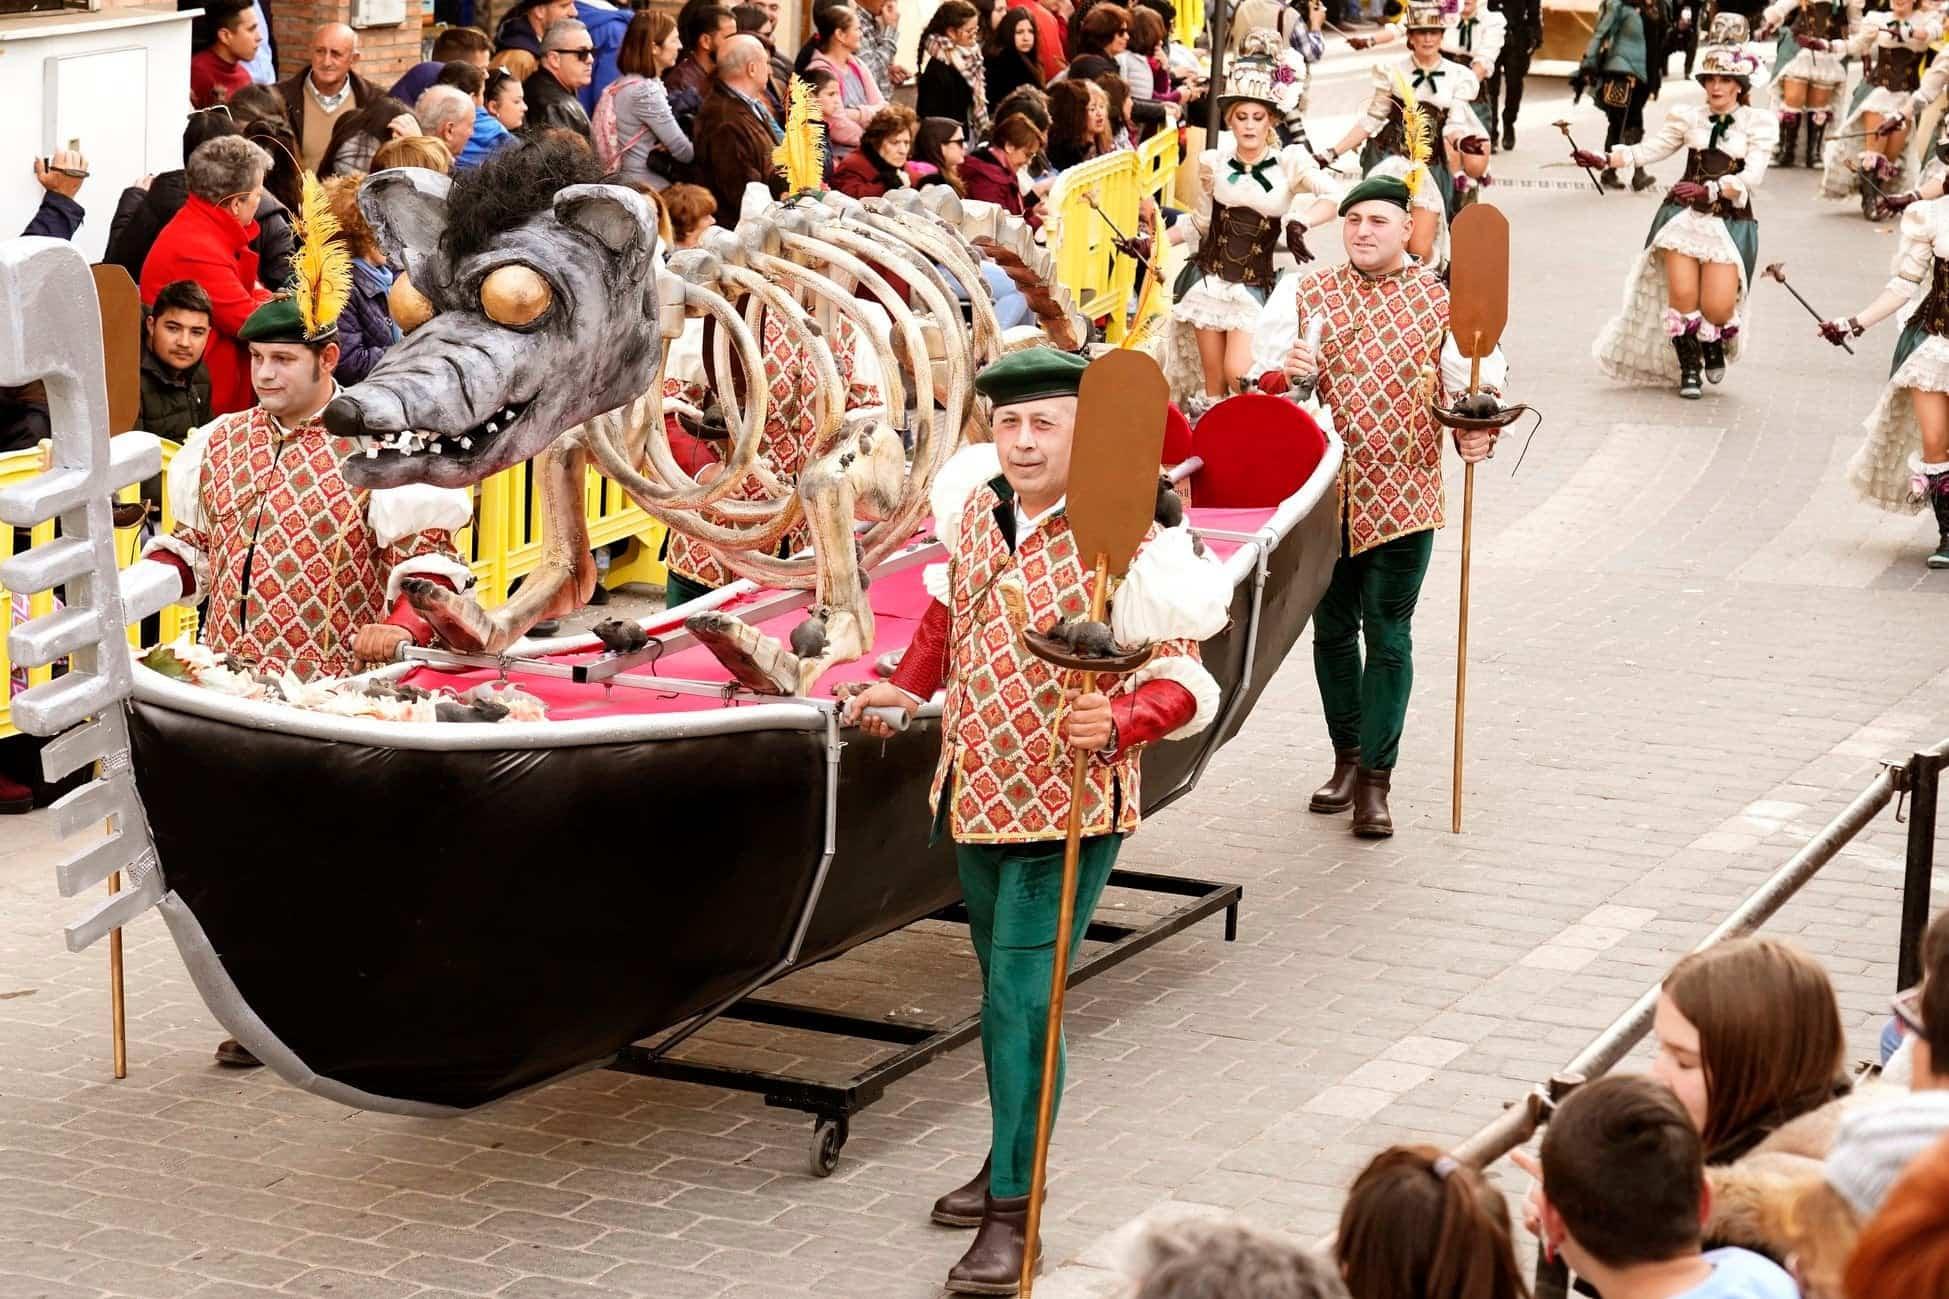 Carnaval de herencia 2020 ofertorio 53 - Selección de fotografías del Ofertorio del Carnaval de Herencia